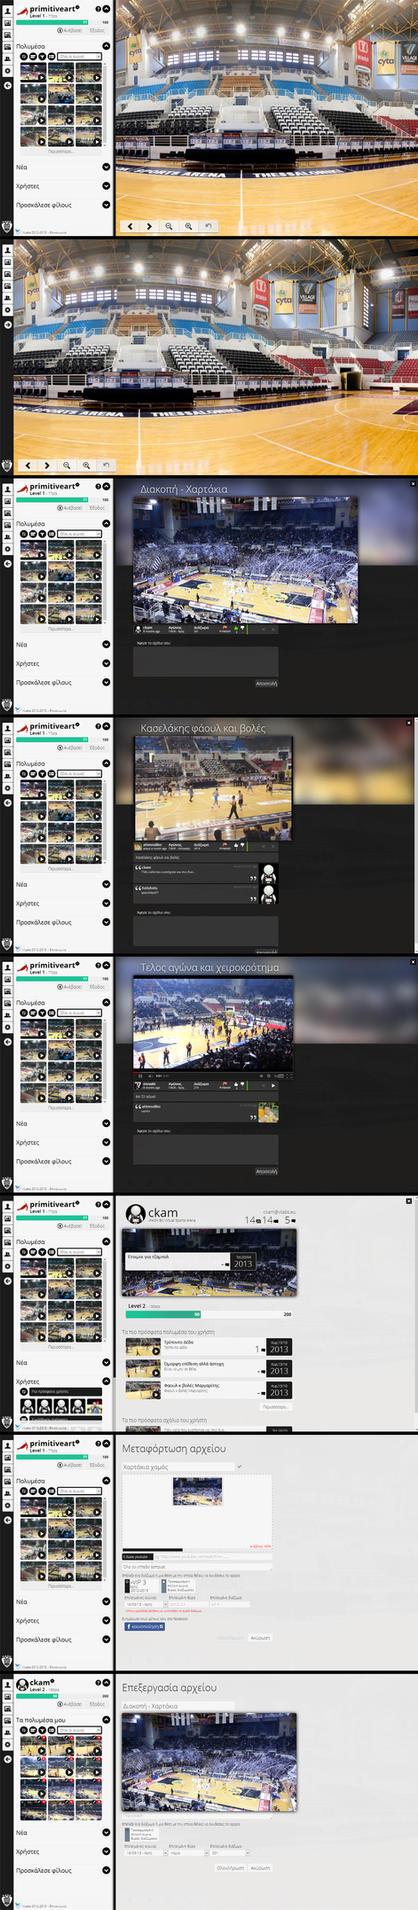 Paokbc.virta.gr screenshots by primitiveart-87